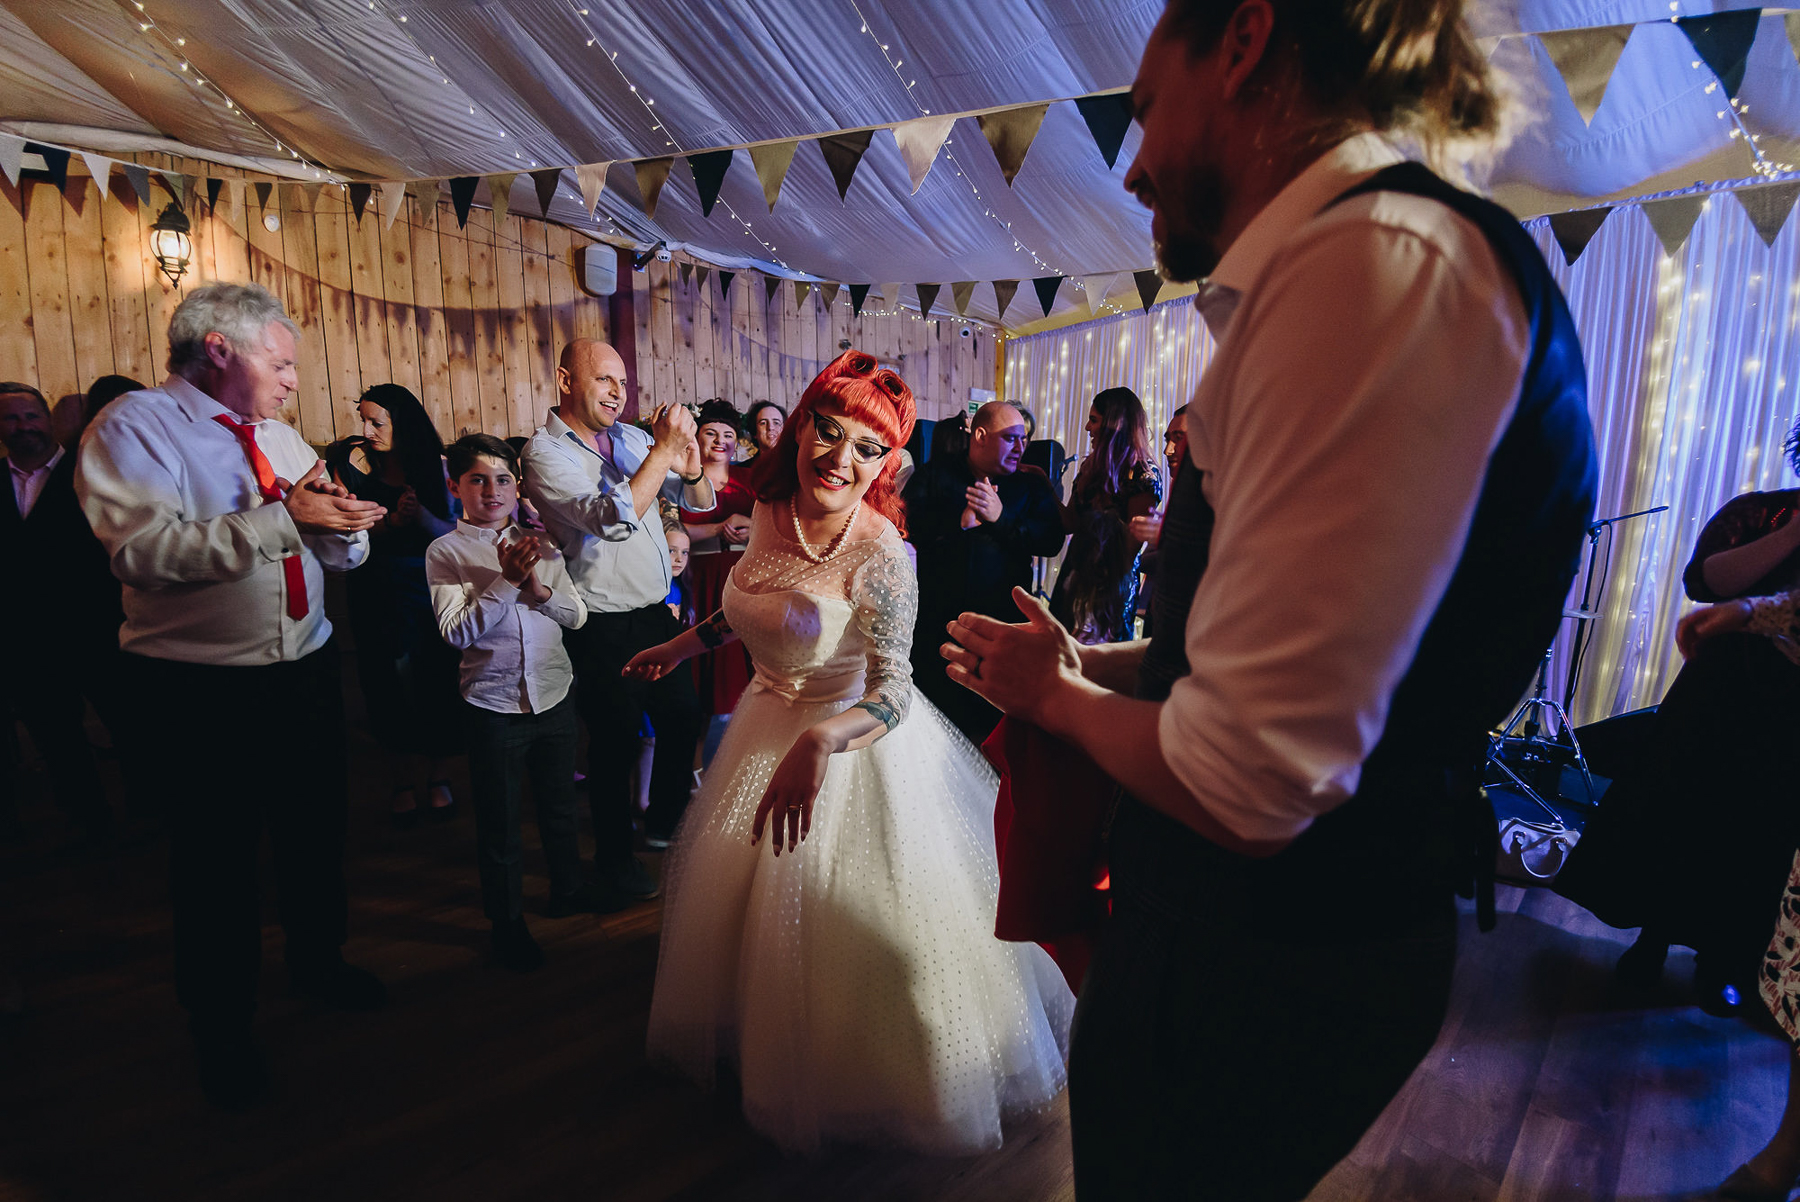 Wellbeing_Farm_Wedding_Photography_The_Pin-Up_Bride_Lara_Shaun-181.jpg